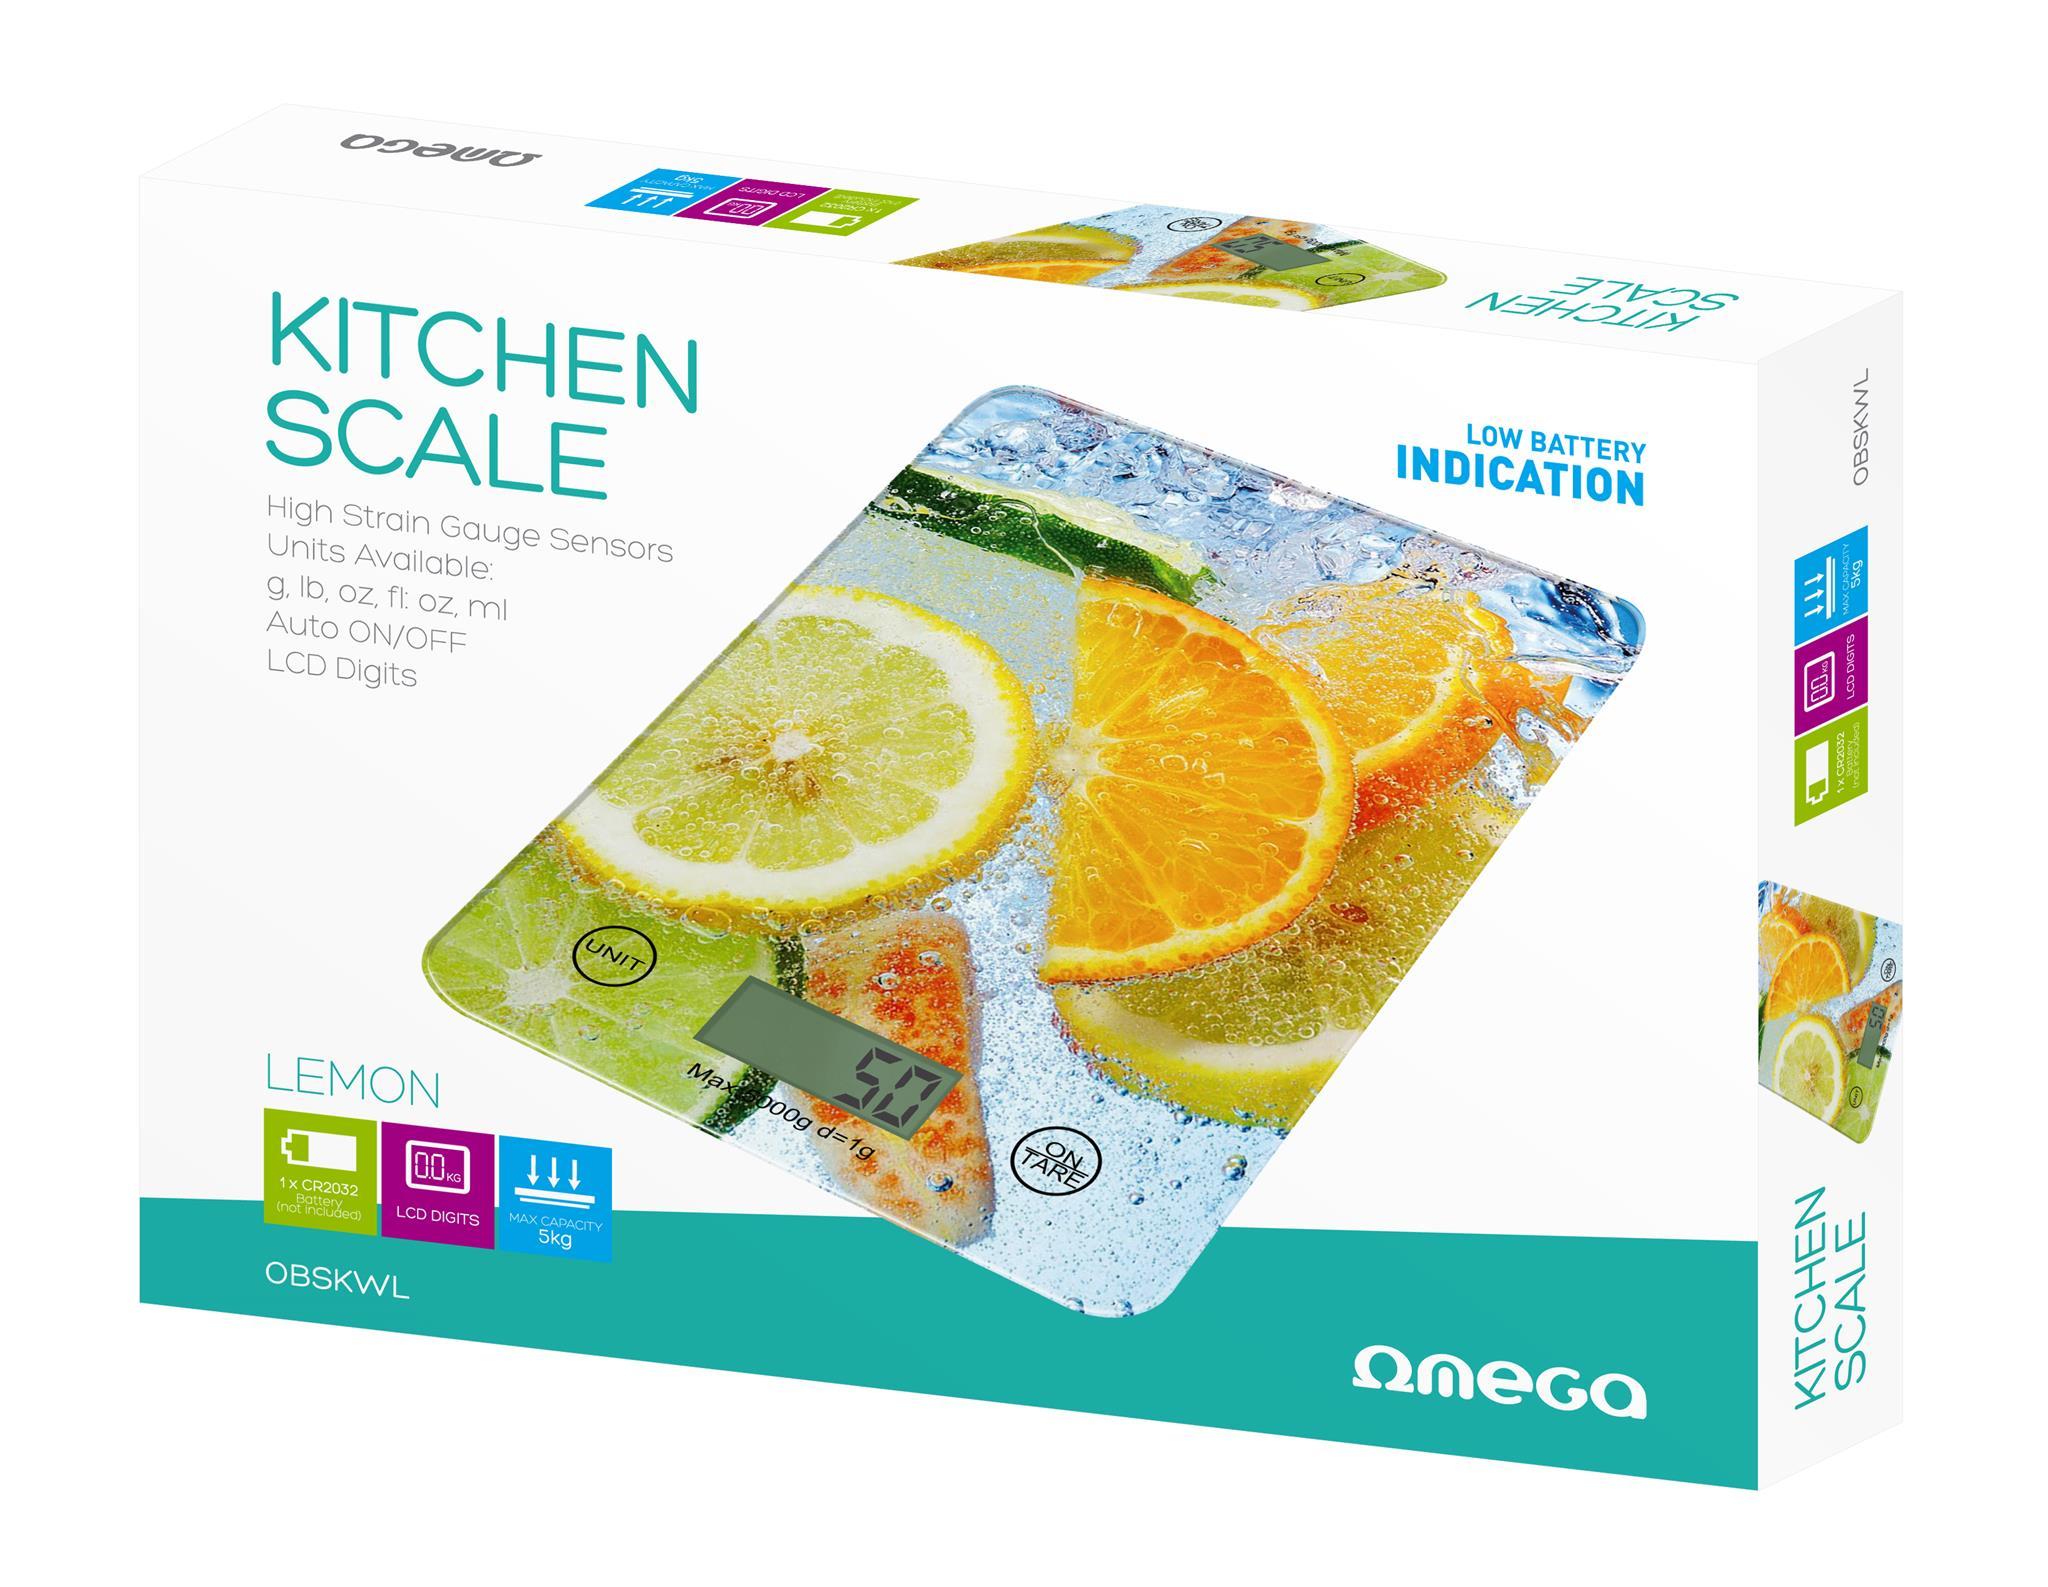 Keukenweegschaal - citrusvruchten -, 1x CR2032 (inbegrepen), max 5kg, nauwkeurigheid: 1g, auto on/off